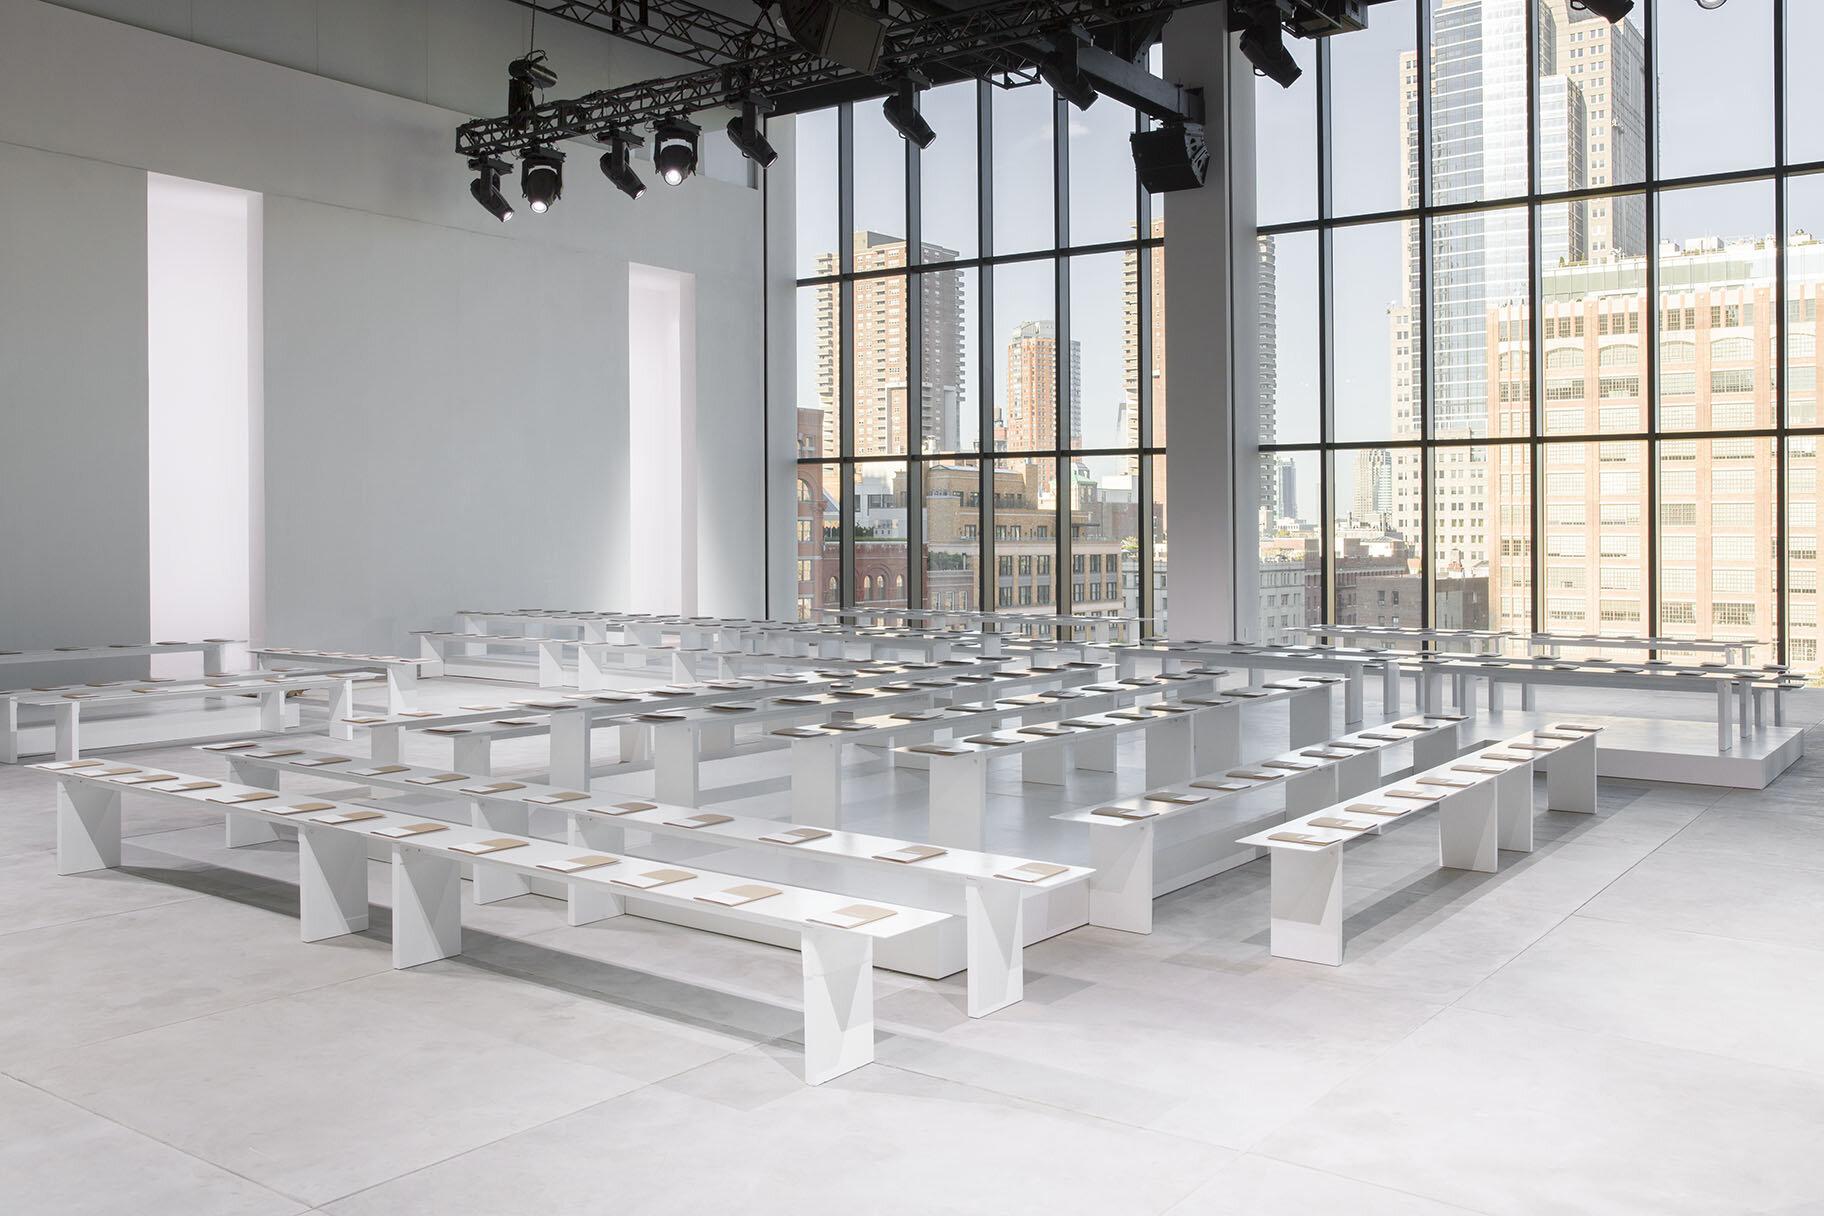 bureau-betak-michael-kors-new-york-gallery-guillaume-ziccarelli-03.jpg